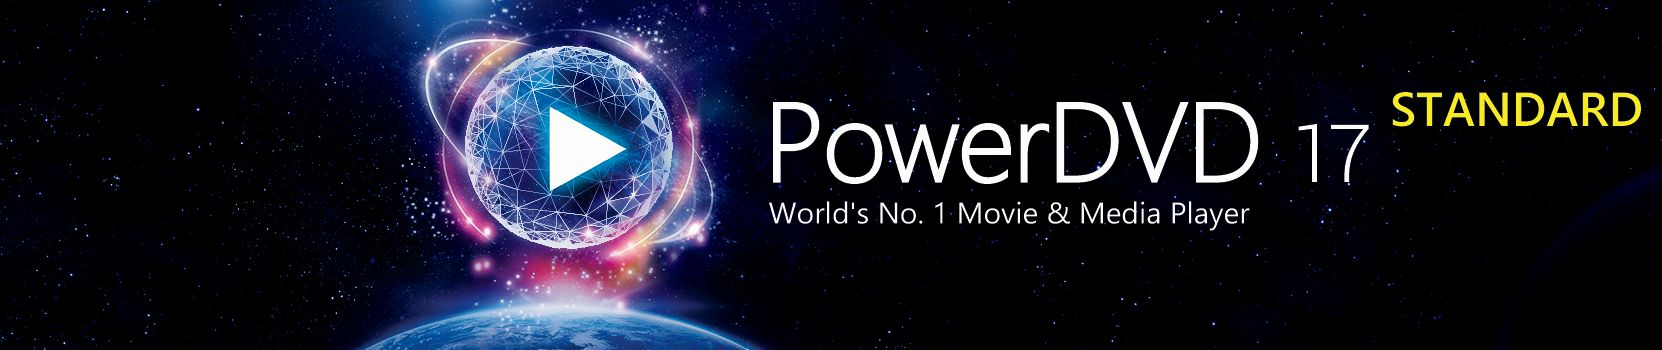 PowerDVDStandard